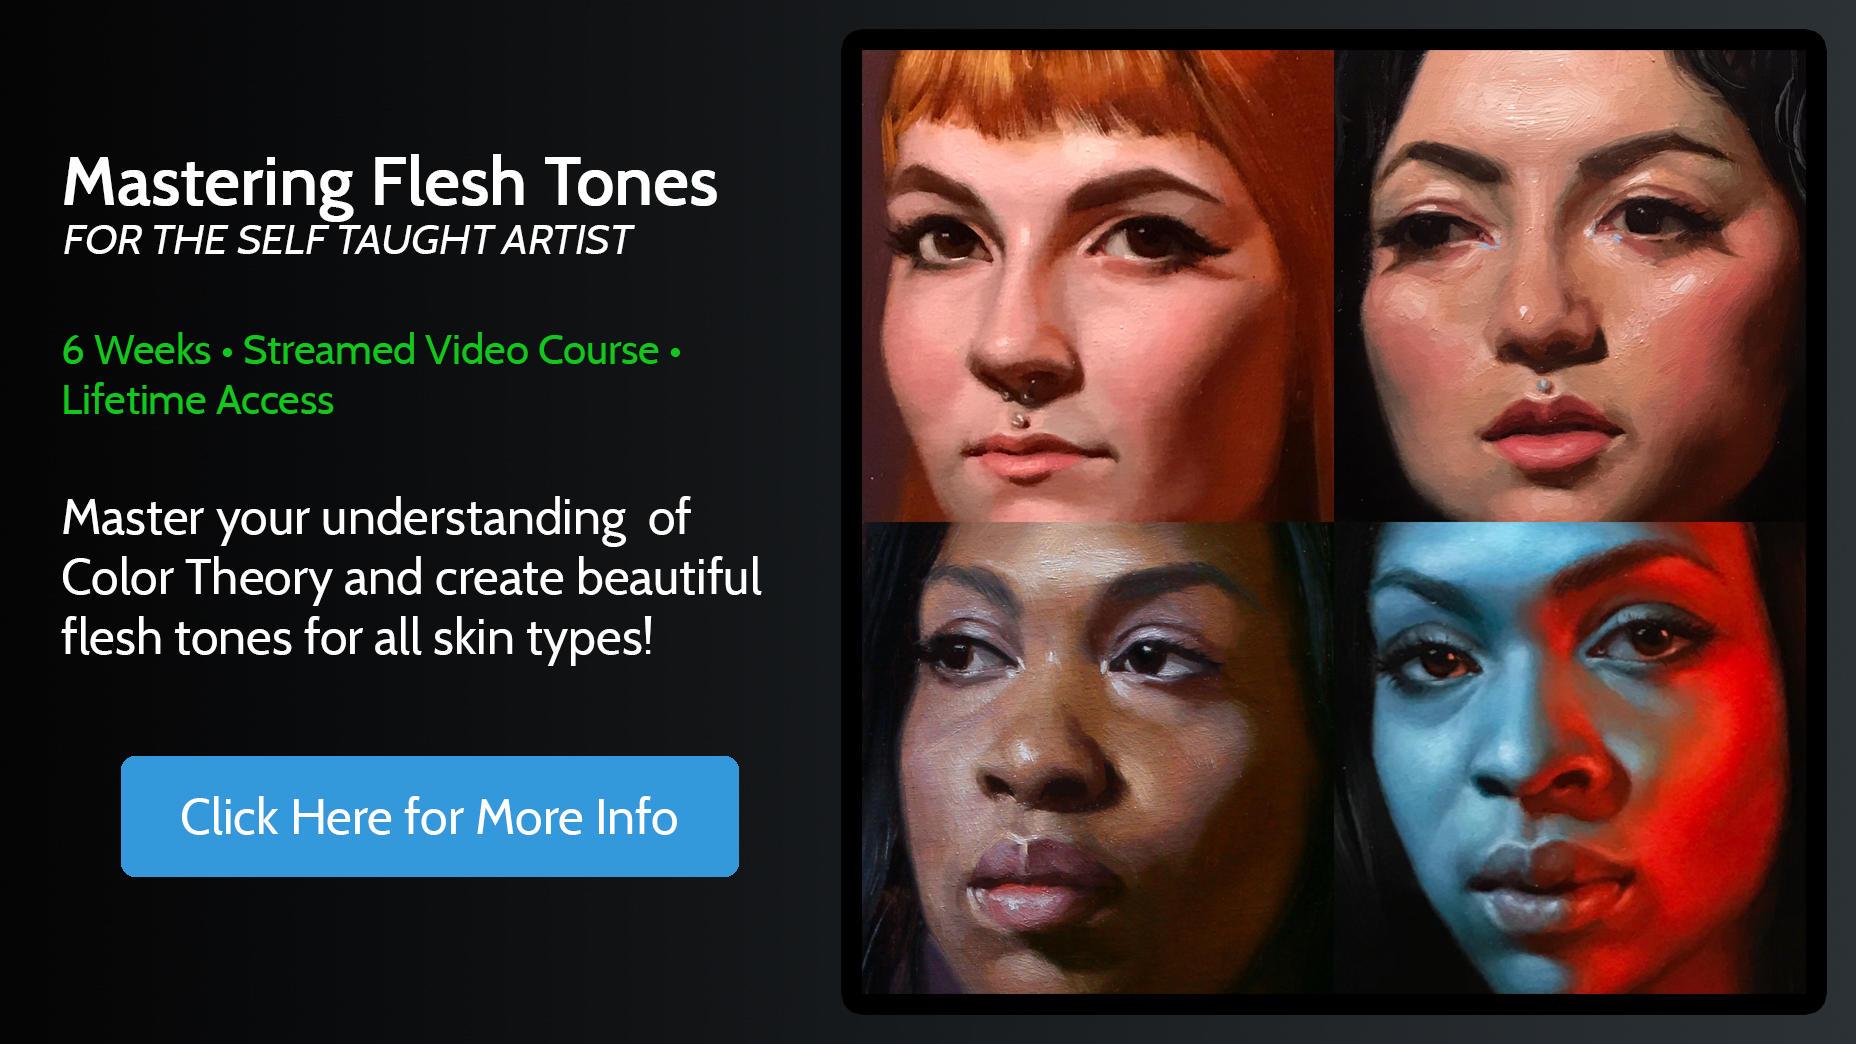 Mastering Flesh Tones Online Course